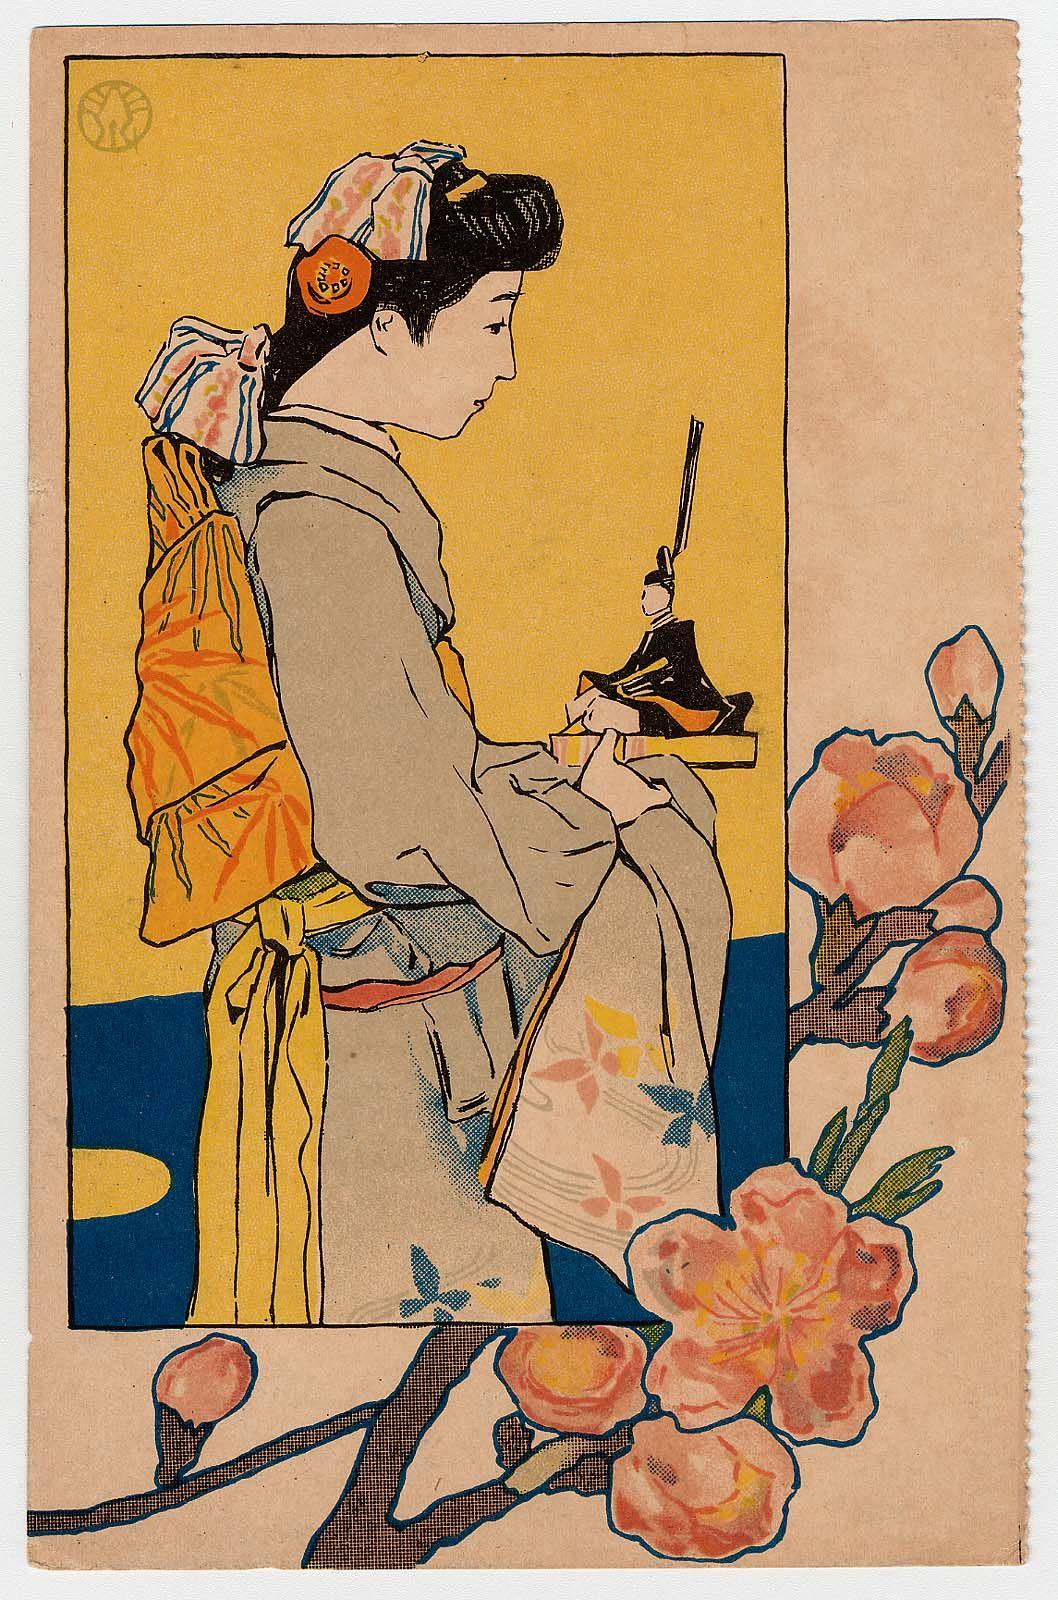 "taishou-kun: ""Sugiura Hisui 杉浦 非水 (1876-1965) Hina matsuri 雛祭り (Girls' Festival) from Jogaku sekai 女学世界 (Women studies the world) magazine - Japan - 1910s Source : MFA Boston """